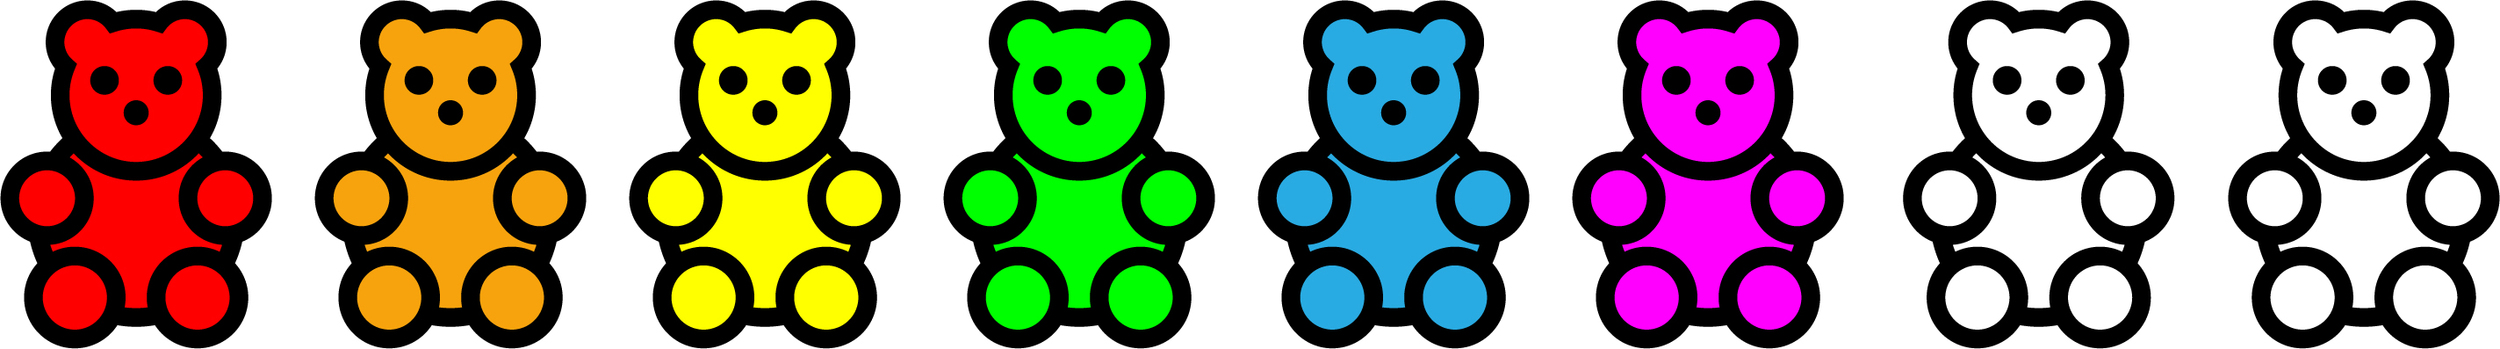 TINKY-BEAR-INTEGRAL.jpg